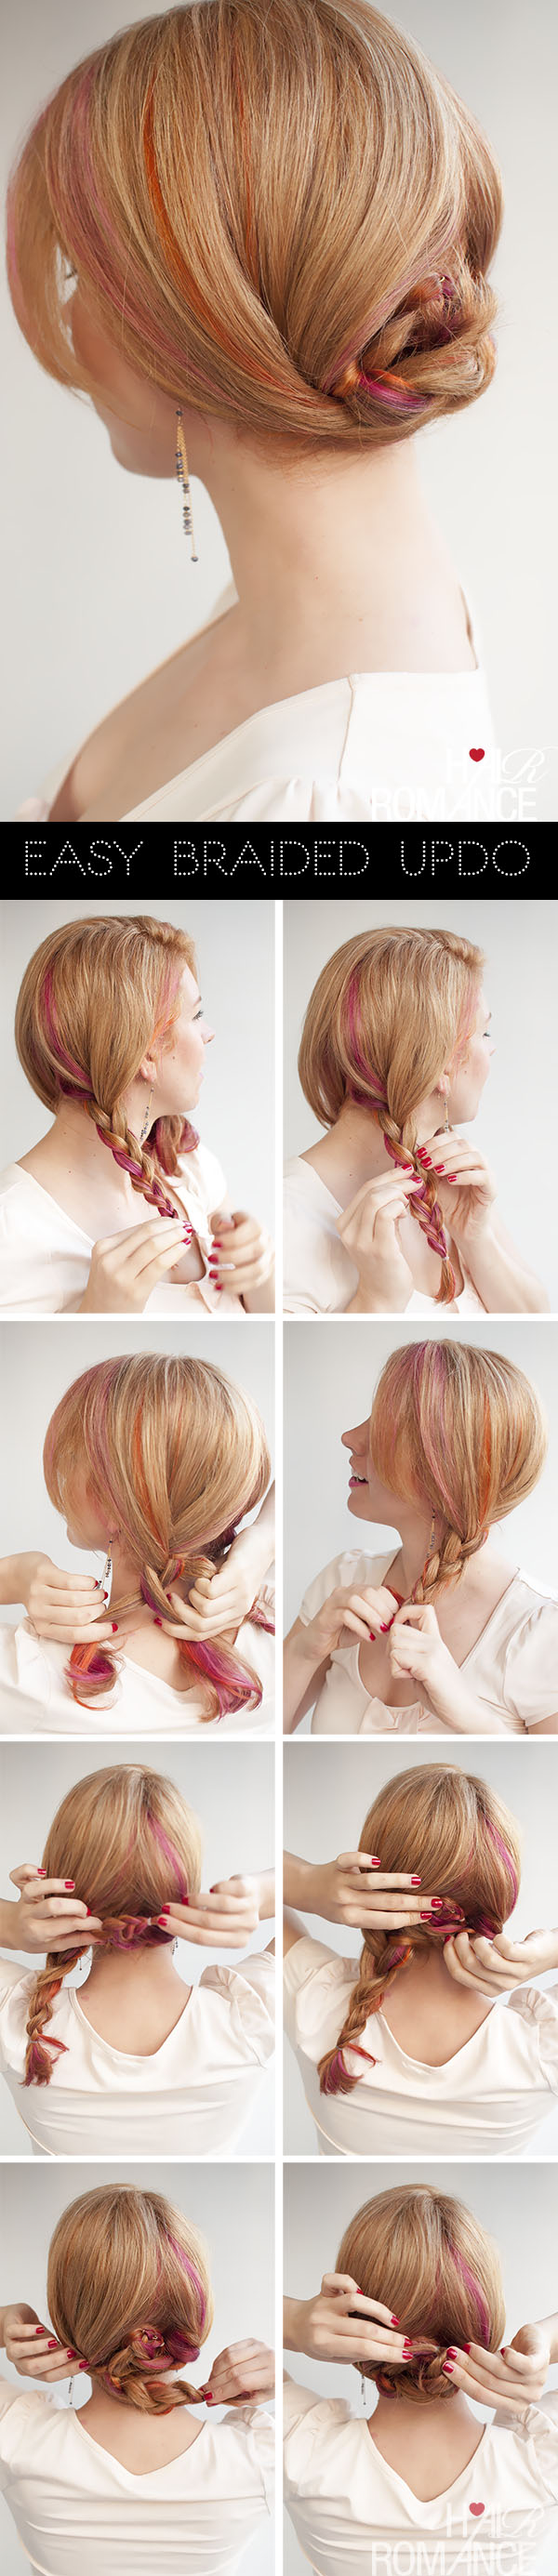 Hair-Romance-easy-braid-updo-hairstyle-tutorial